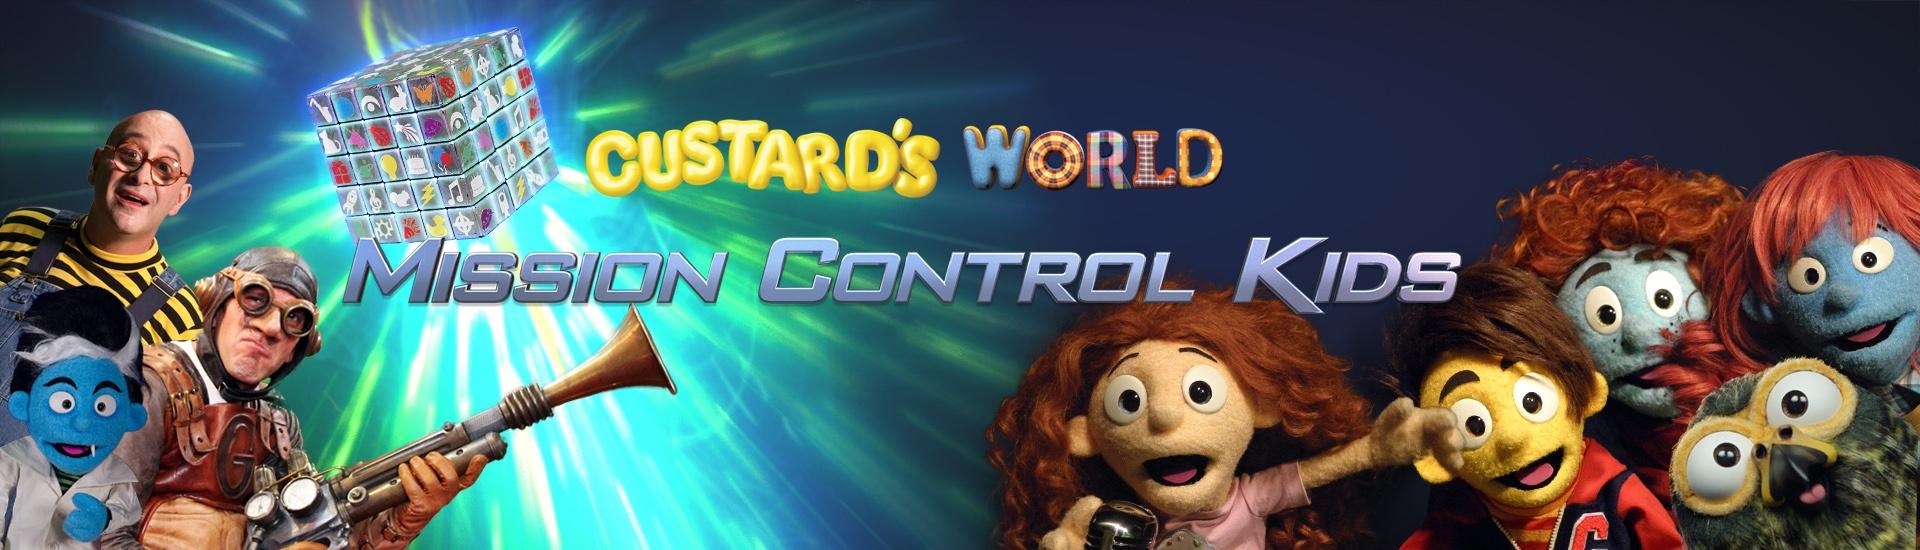 Mission Control Kids